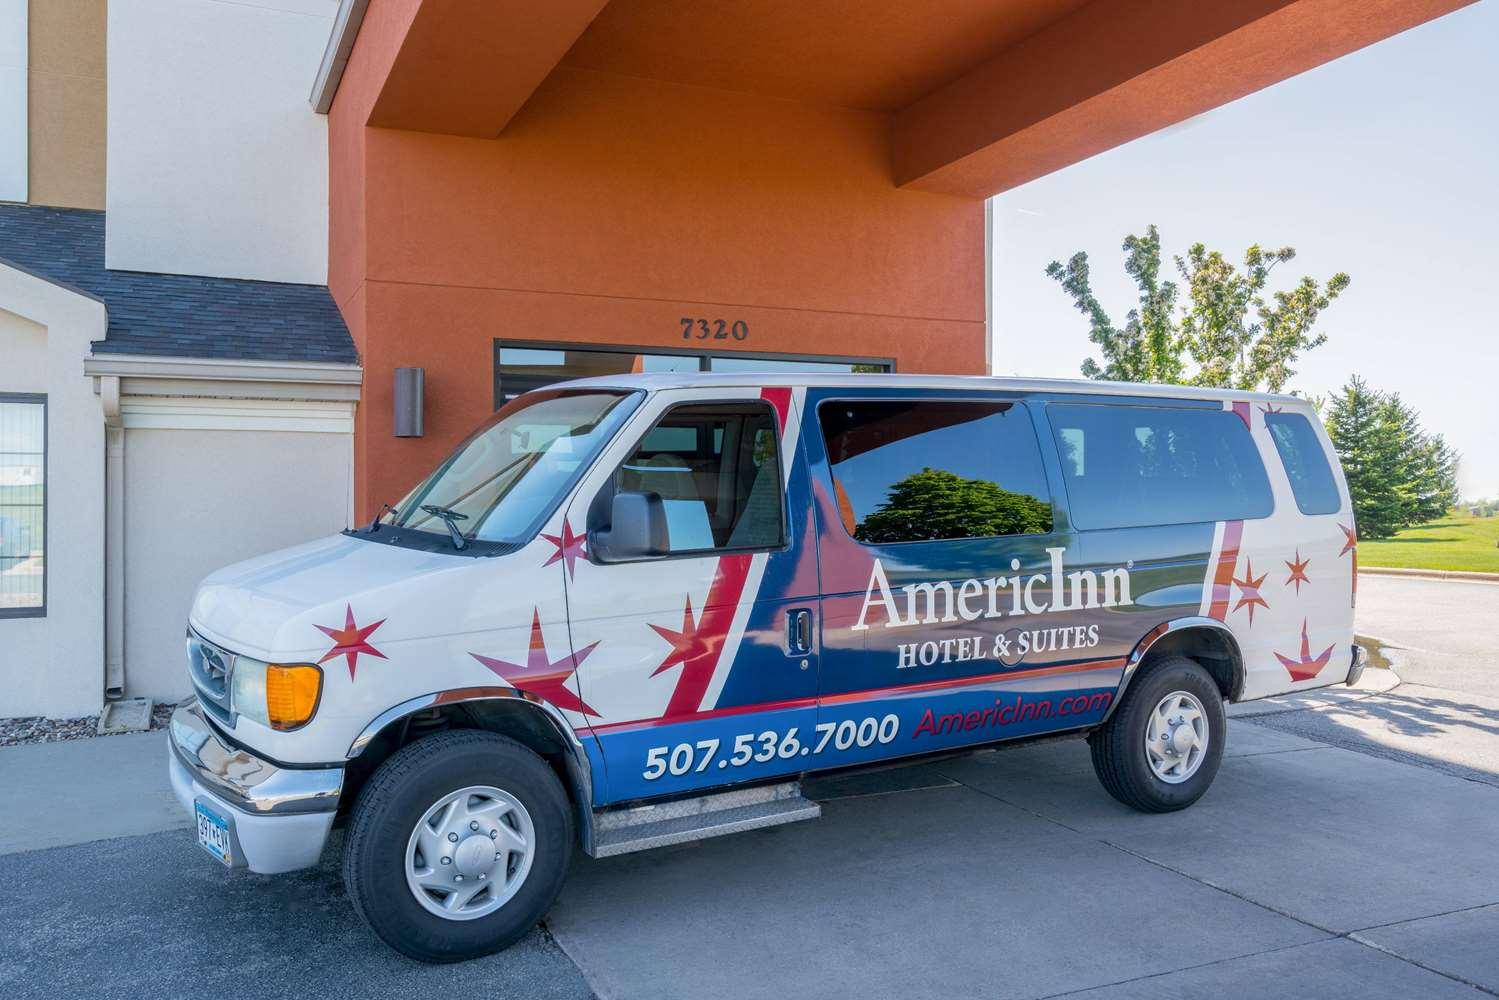 proam - AmericInn Hotel & Suites Airport Rochester